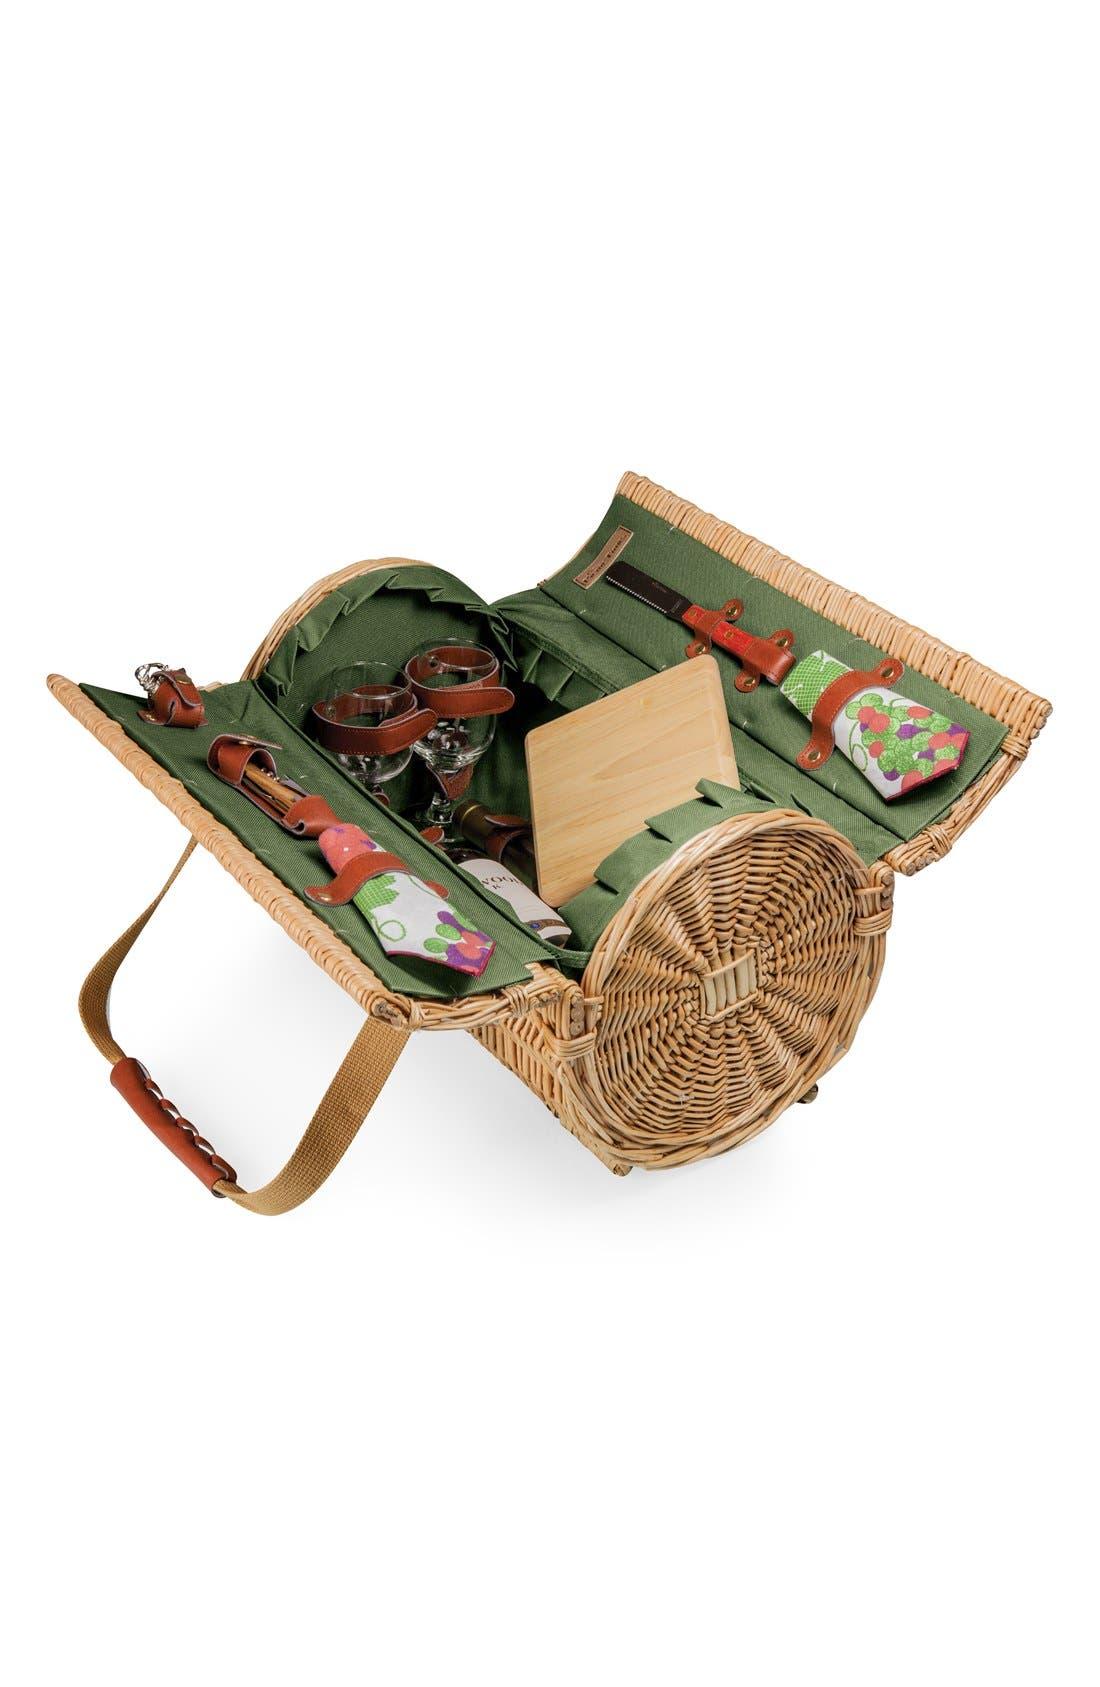 Main Image - Picnic Time 'Verona' Wicker Picnic Basket